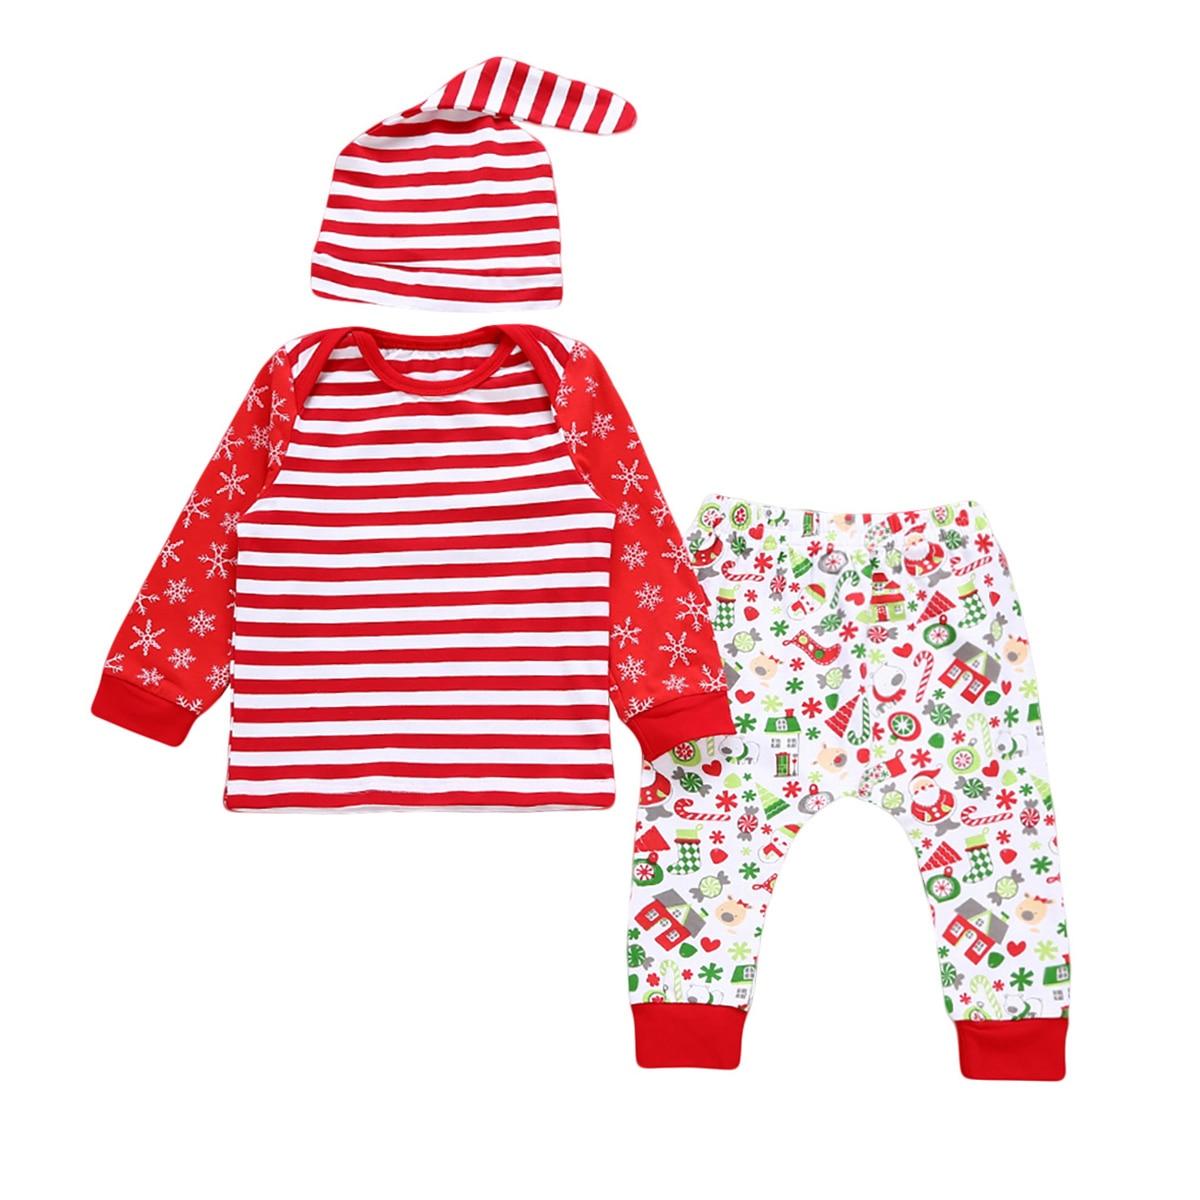 100% QualitäT 2017 New Christmas Baby Kostüme Tuch Säuglings Kleinkind-baby-mädchen Streifen T-shirt Candy Druck Outfits Newborn Christmas Set Buy One Give One